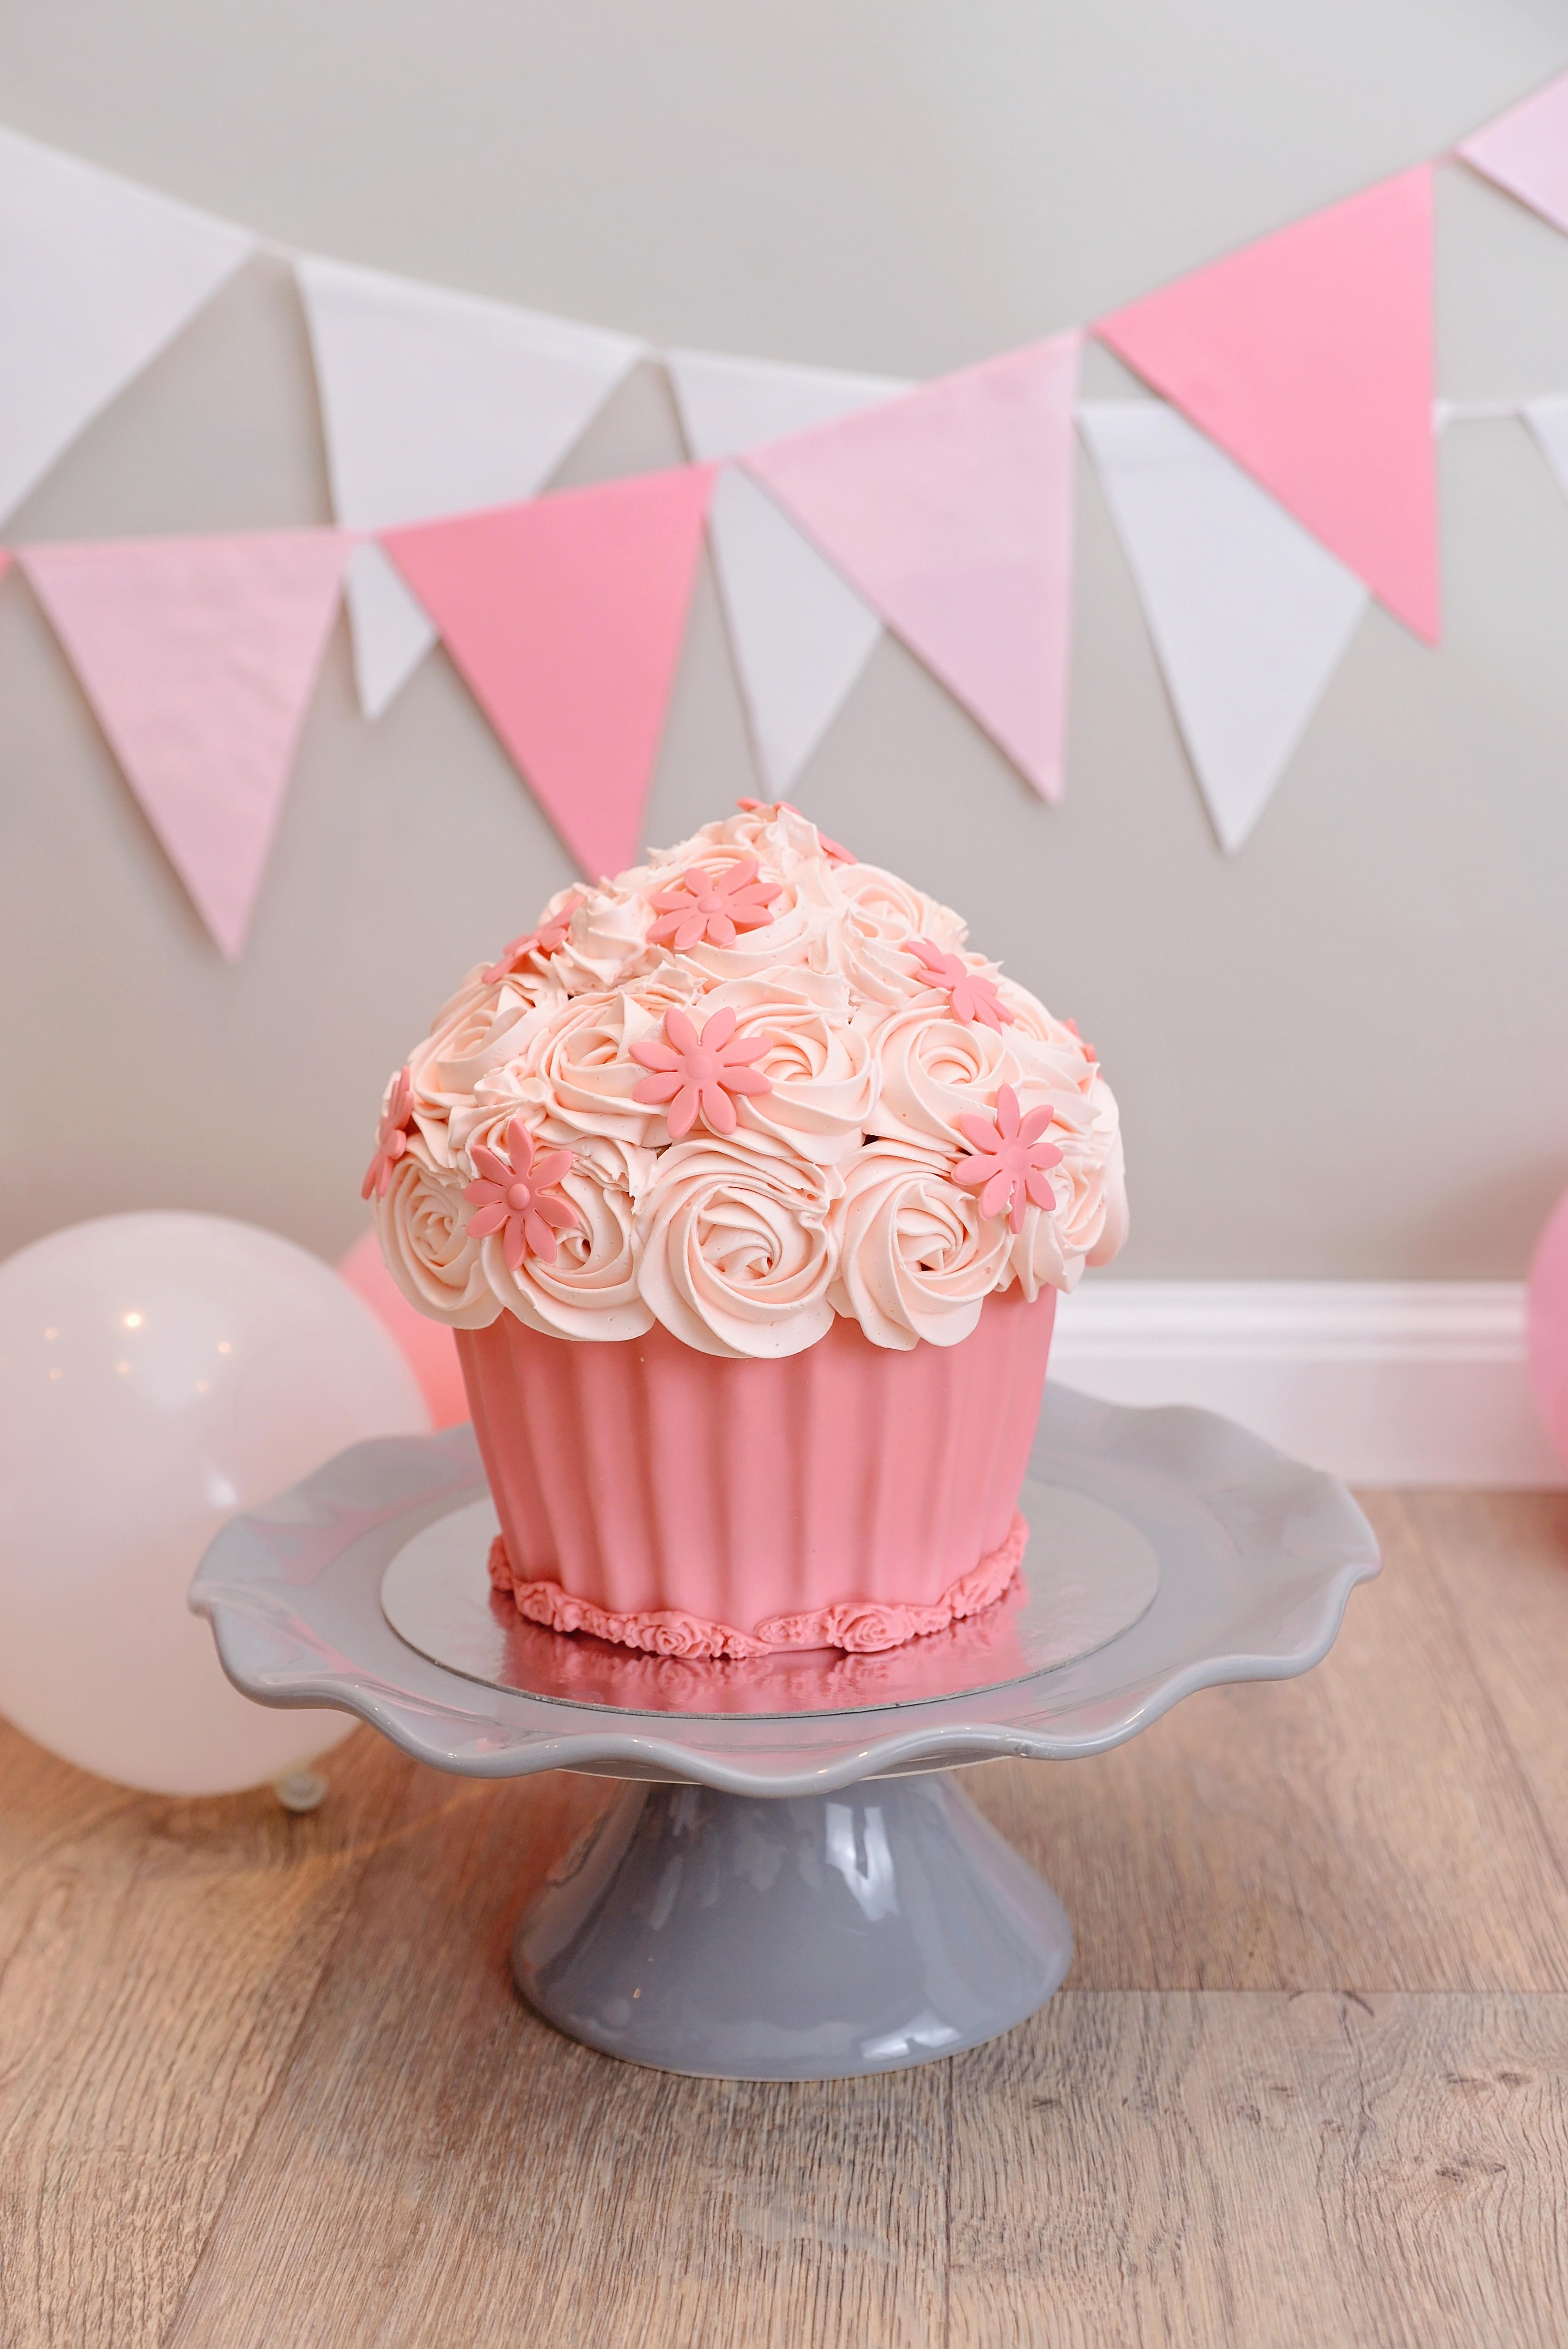 Cake Smash Zoe 17-12-2015 Wonder Fotografie (9)